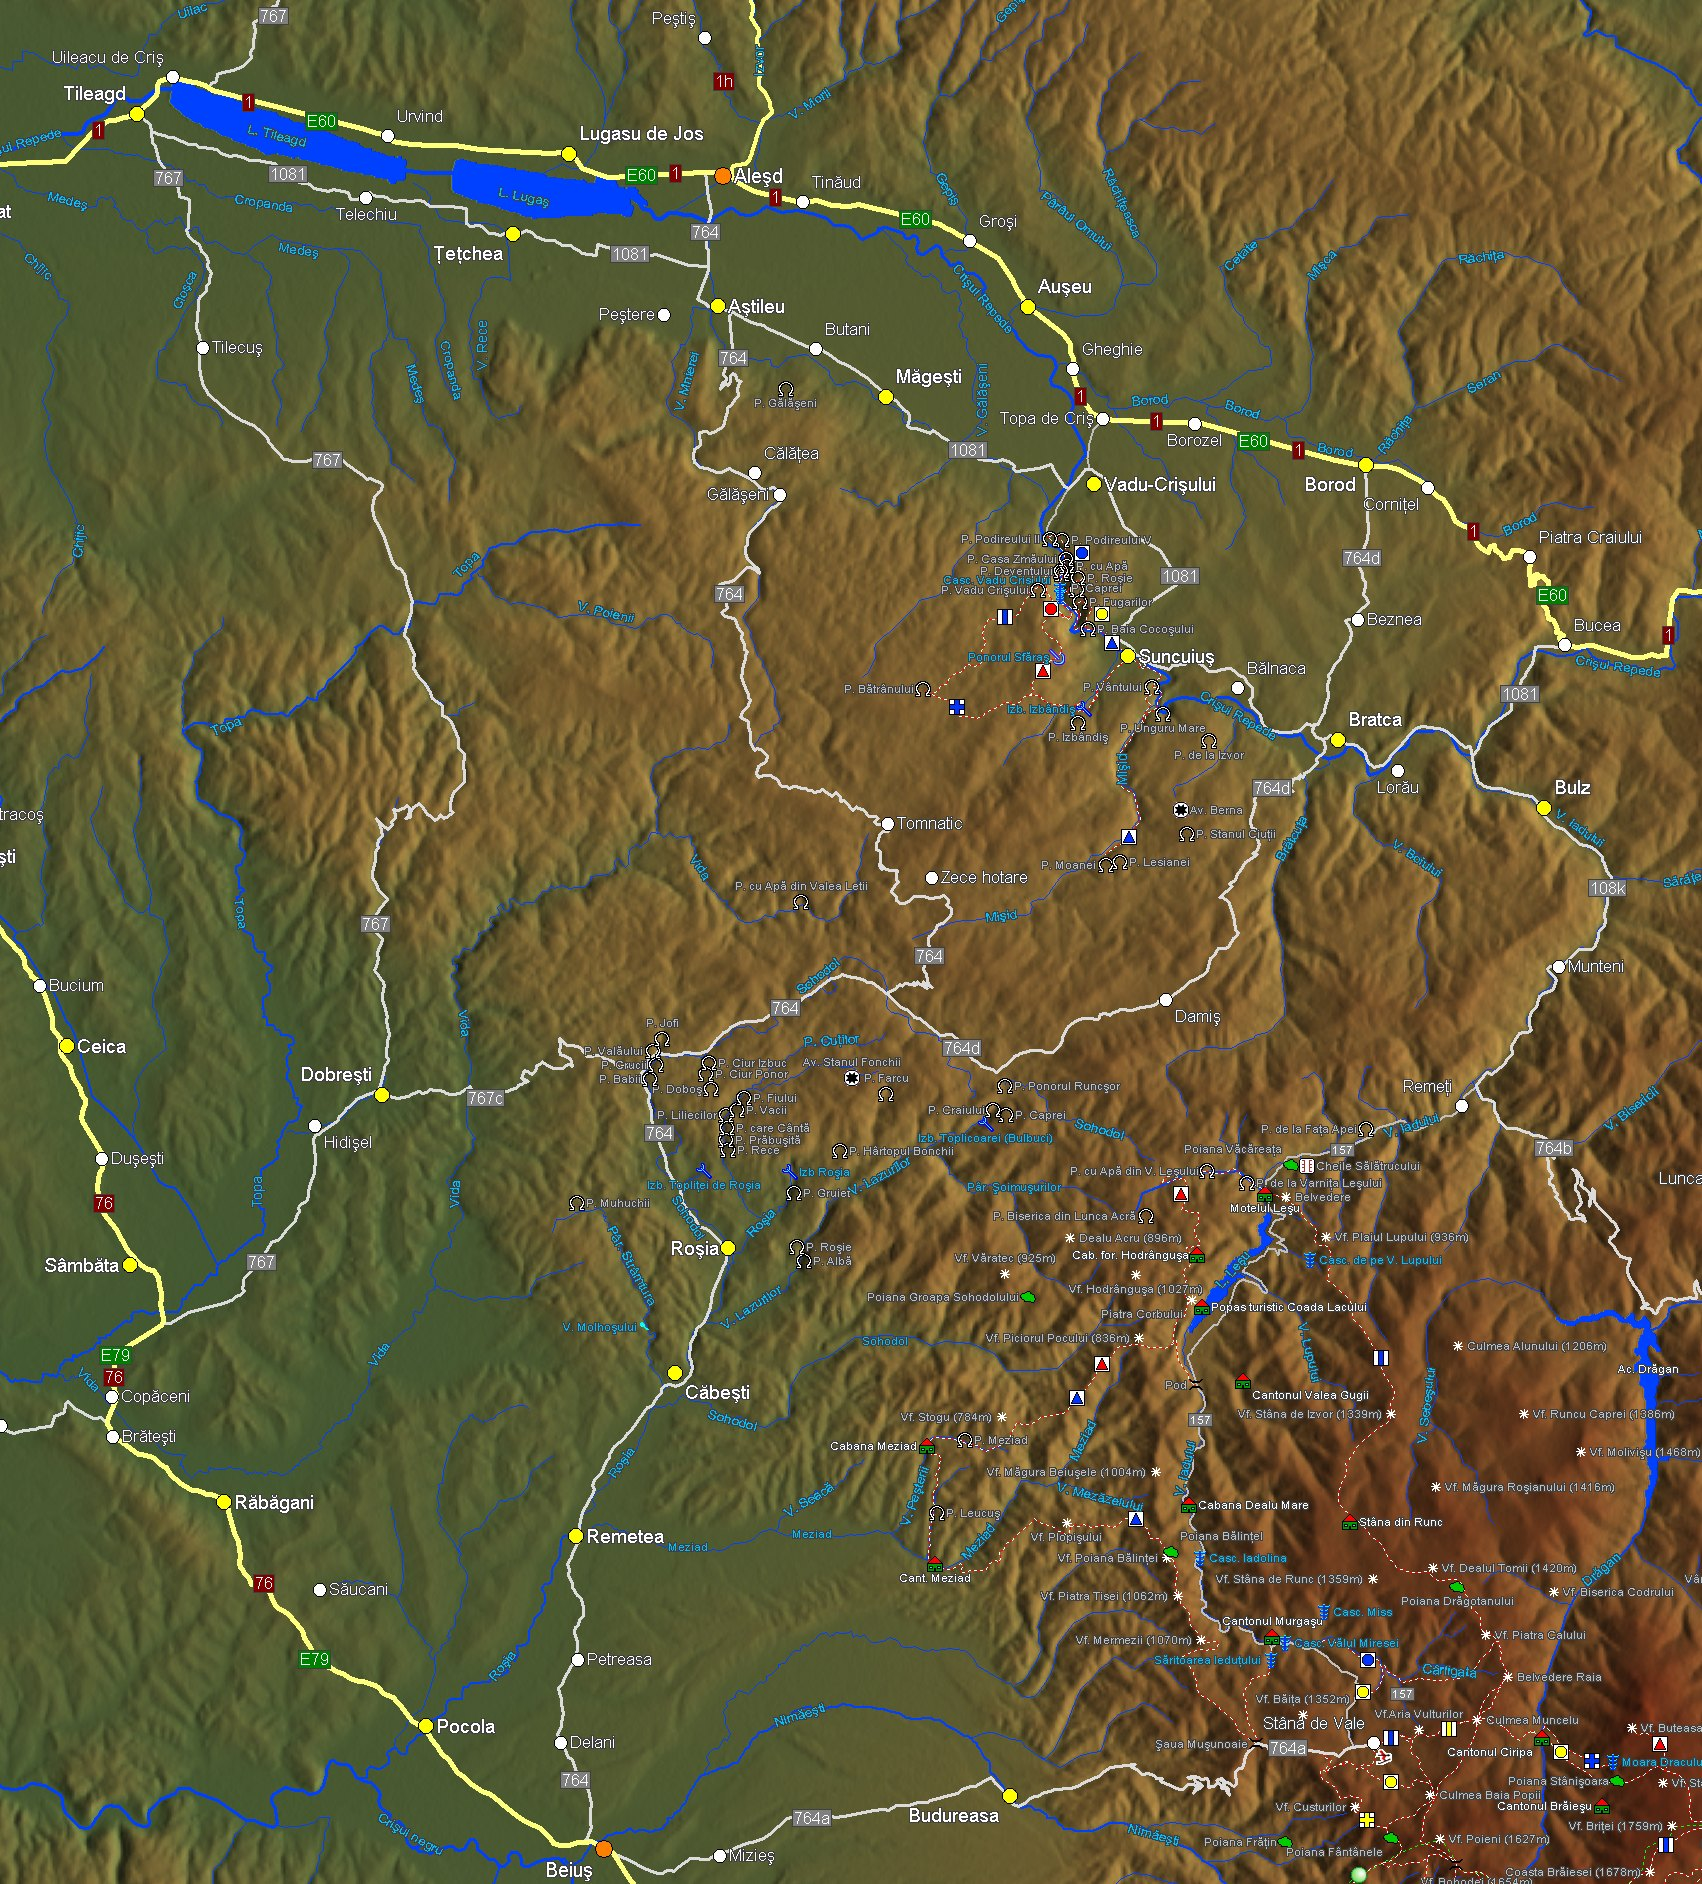 Muntii Padurea Craiului Harta Interactiva Trasee Marcate Si